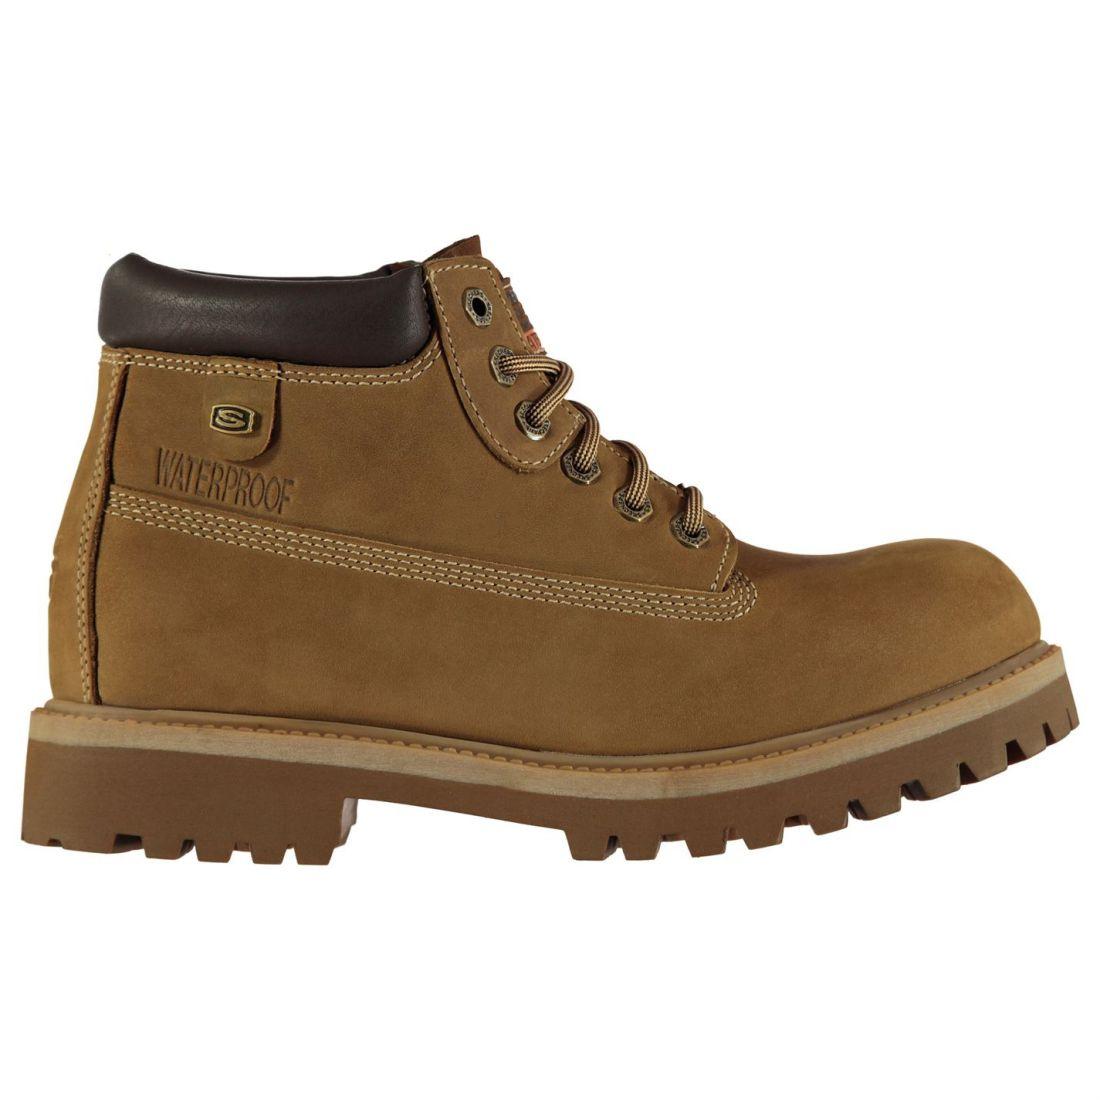 Desierto Sujetados Zapatos días Veredicto Hombres Usa Agua Cordones Todos Caballeros los Botas Skechers 4a7vw8qH